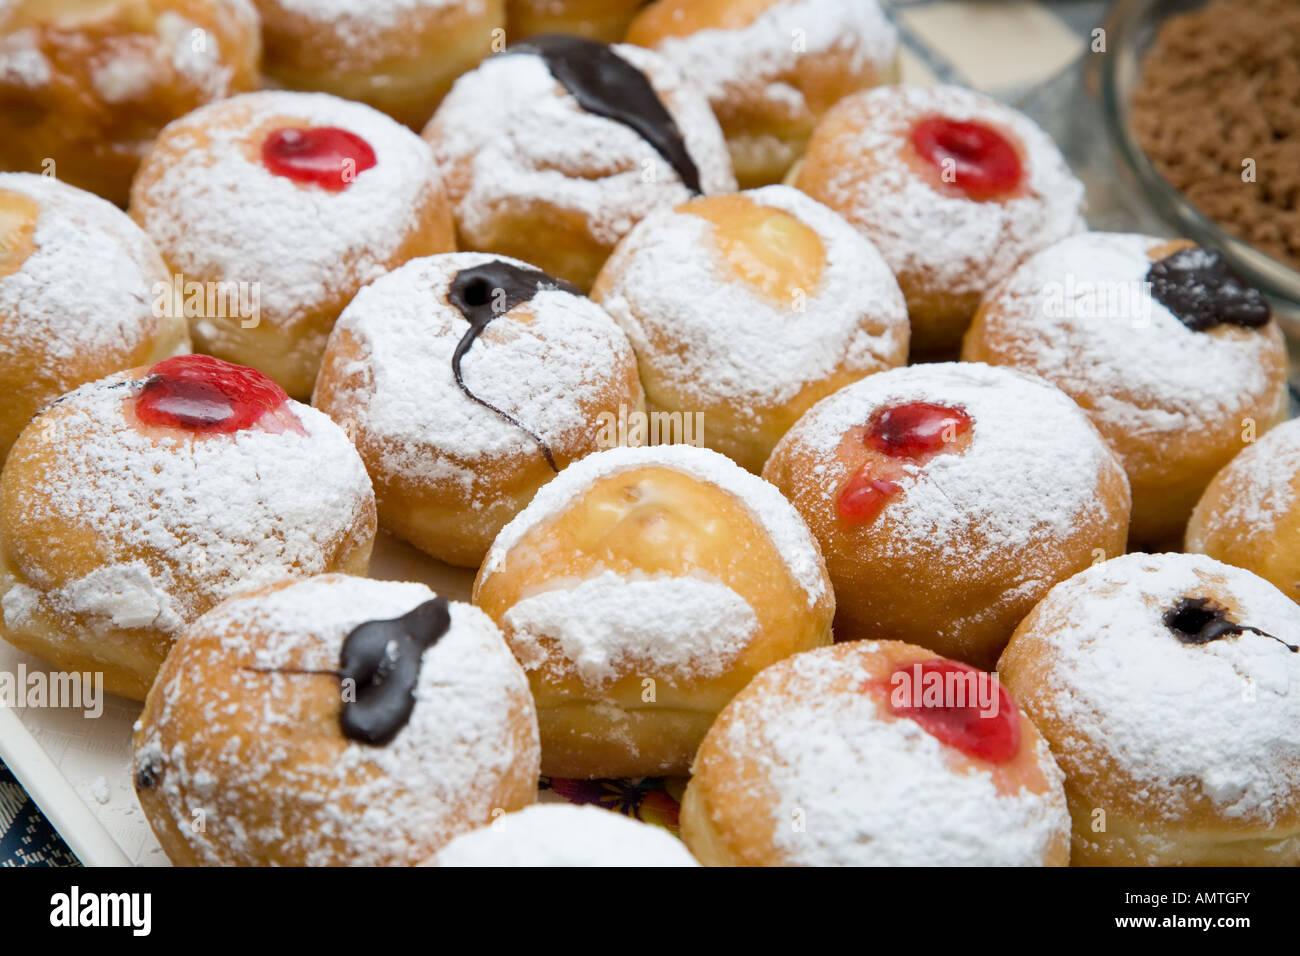 Stock Photo of Traditional Jewish Sufganiyot Doughnuts - Stock Image